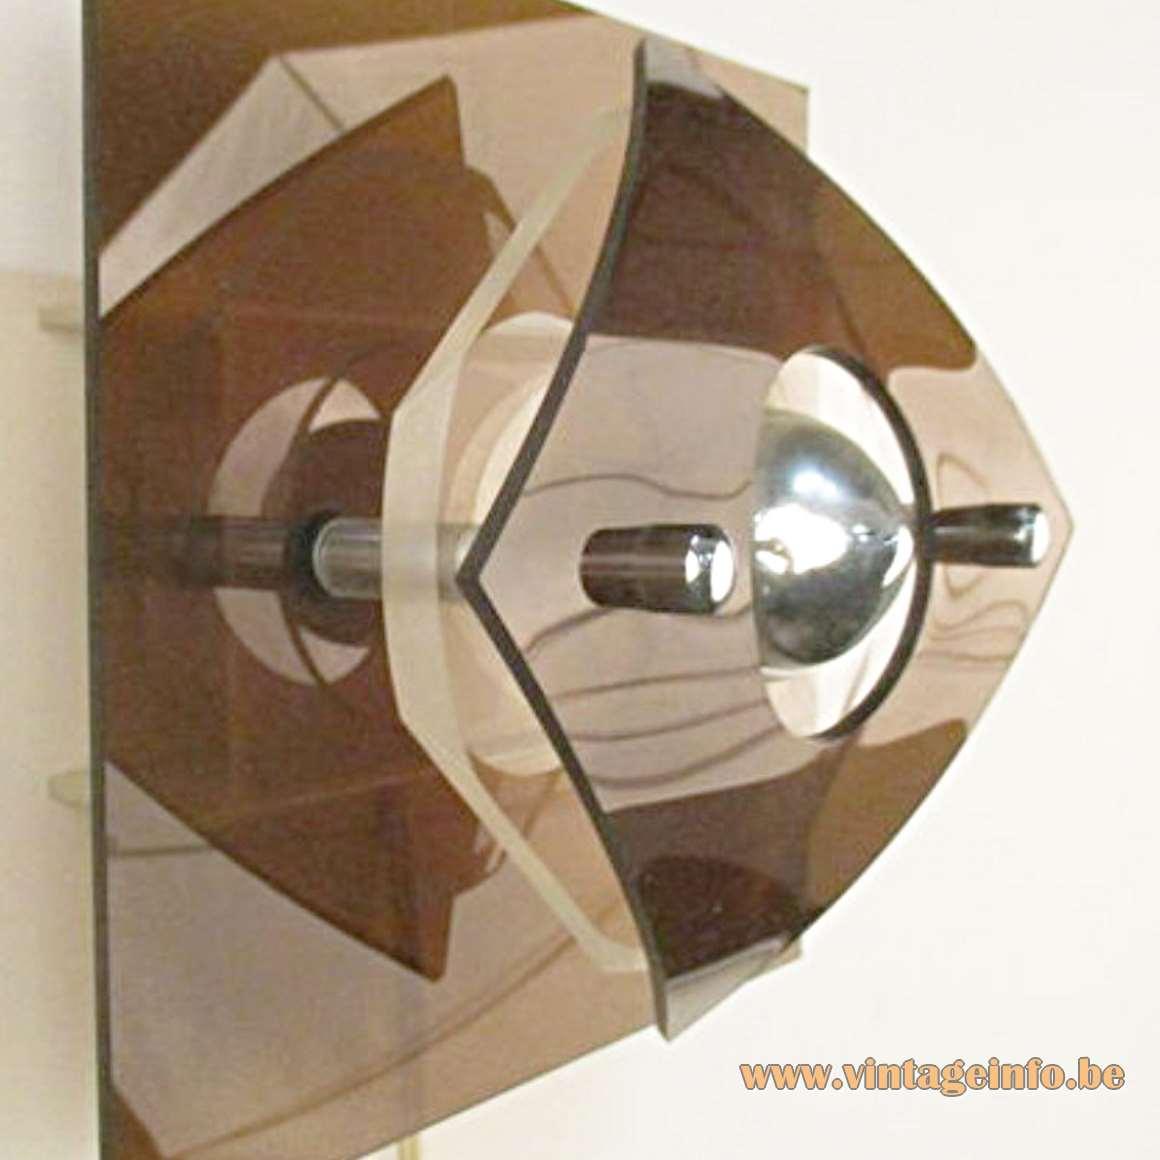 Herda Acrylic Wall Lamp - rounded